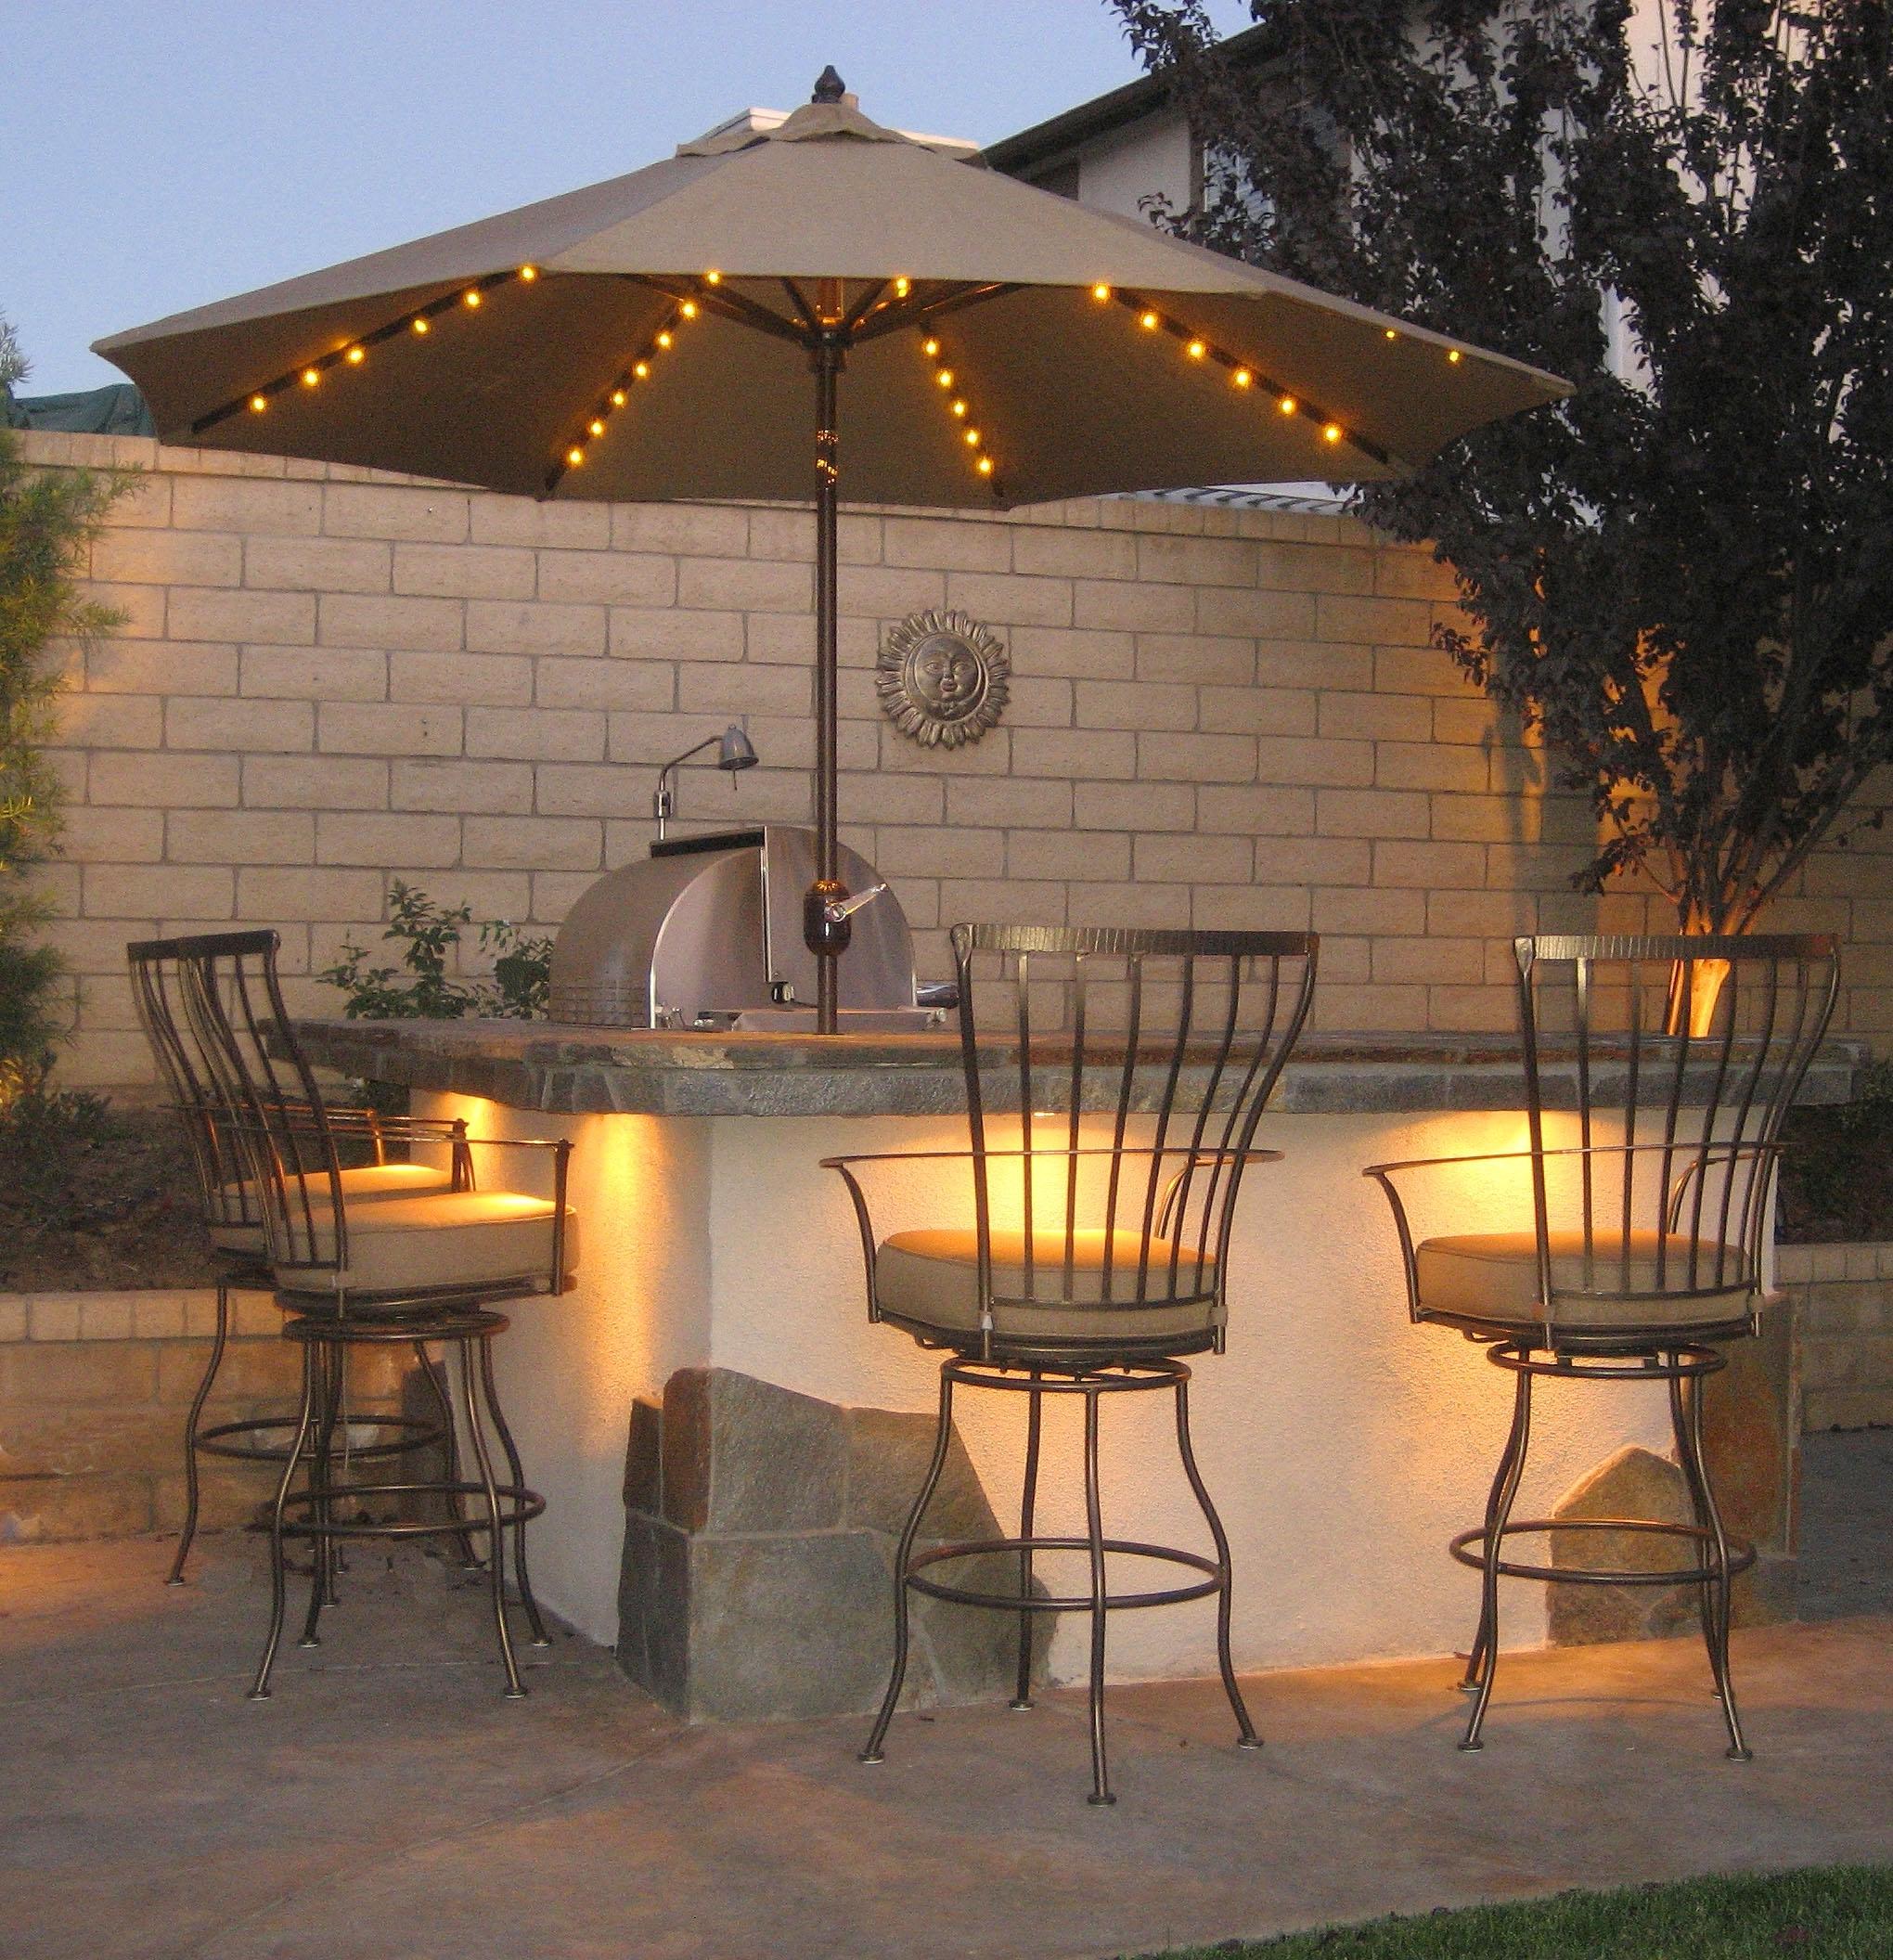 Lighted Patio Umbrellas Regarding Latest Lighted Patio Umbrellas — Mistikcamping Home Design : Different (View 8 of 20)